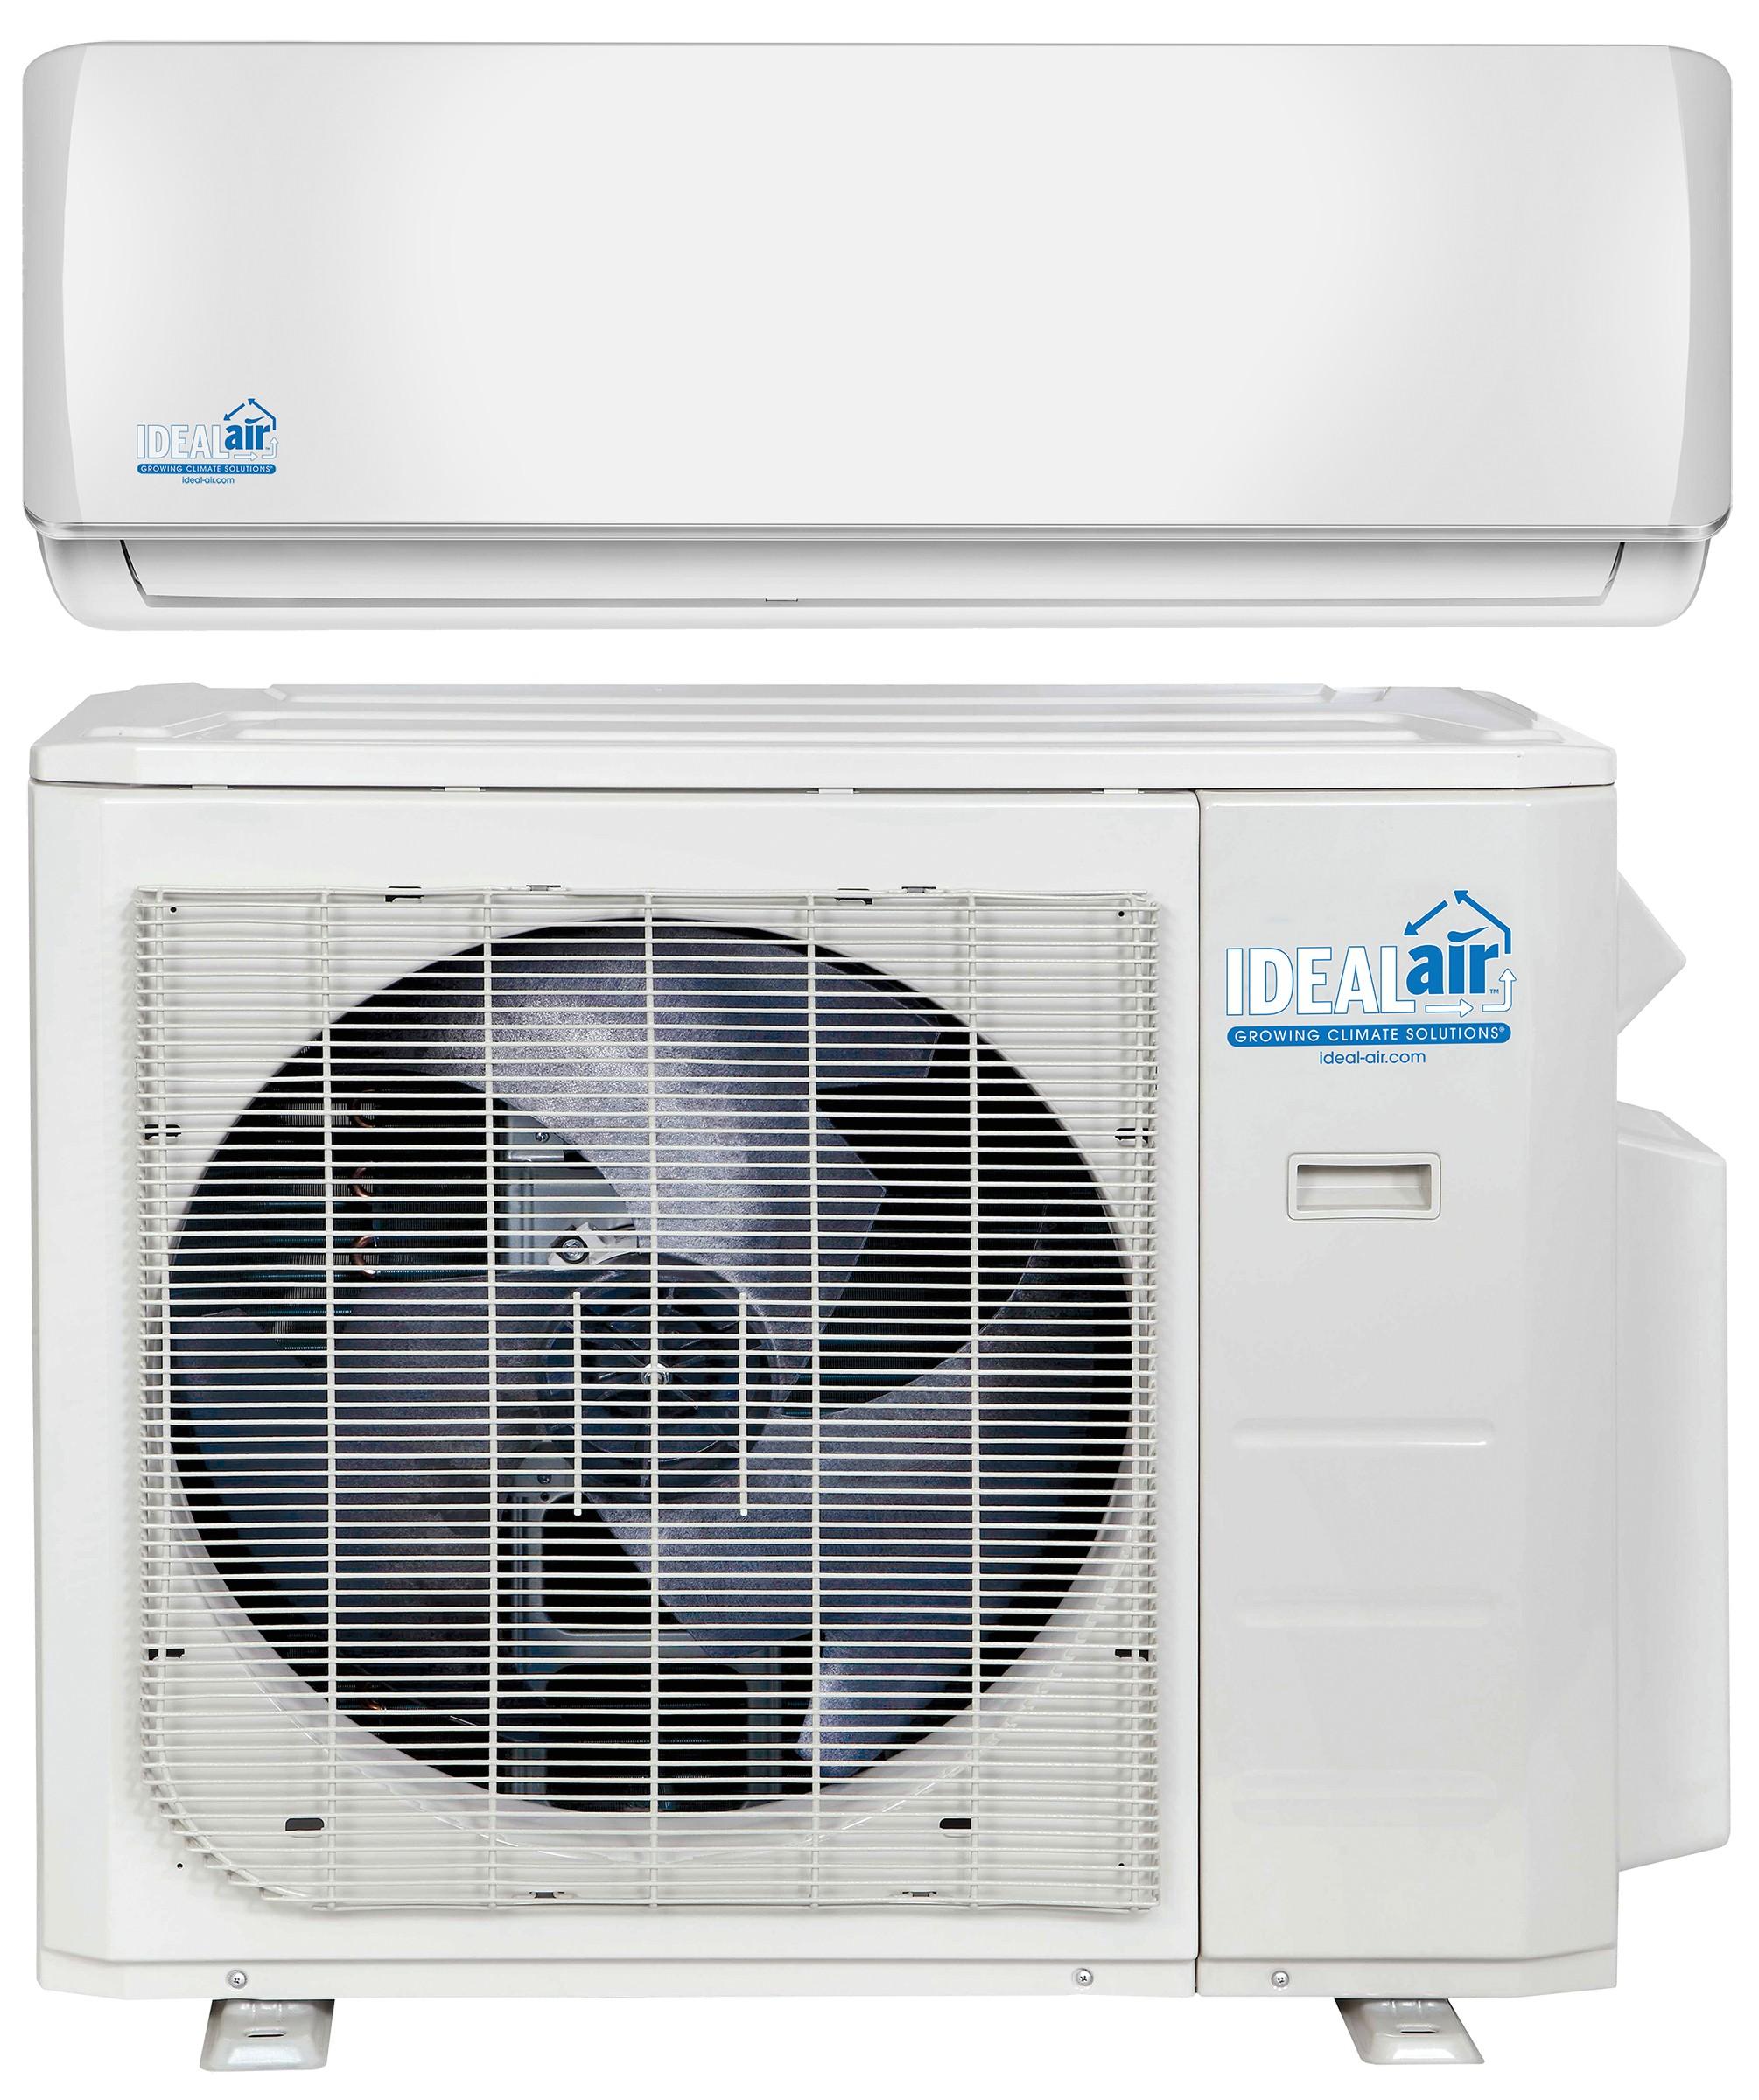 mini split 36 000 btu 16 seer heating cooling part 700808 download image